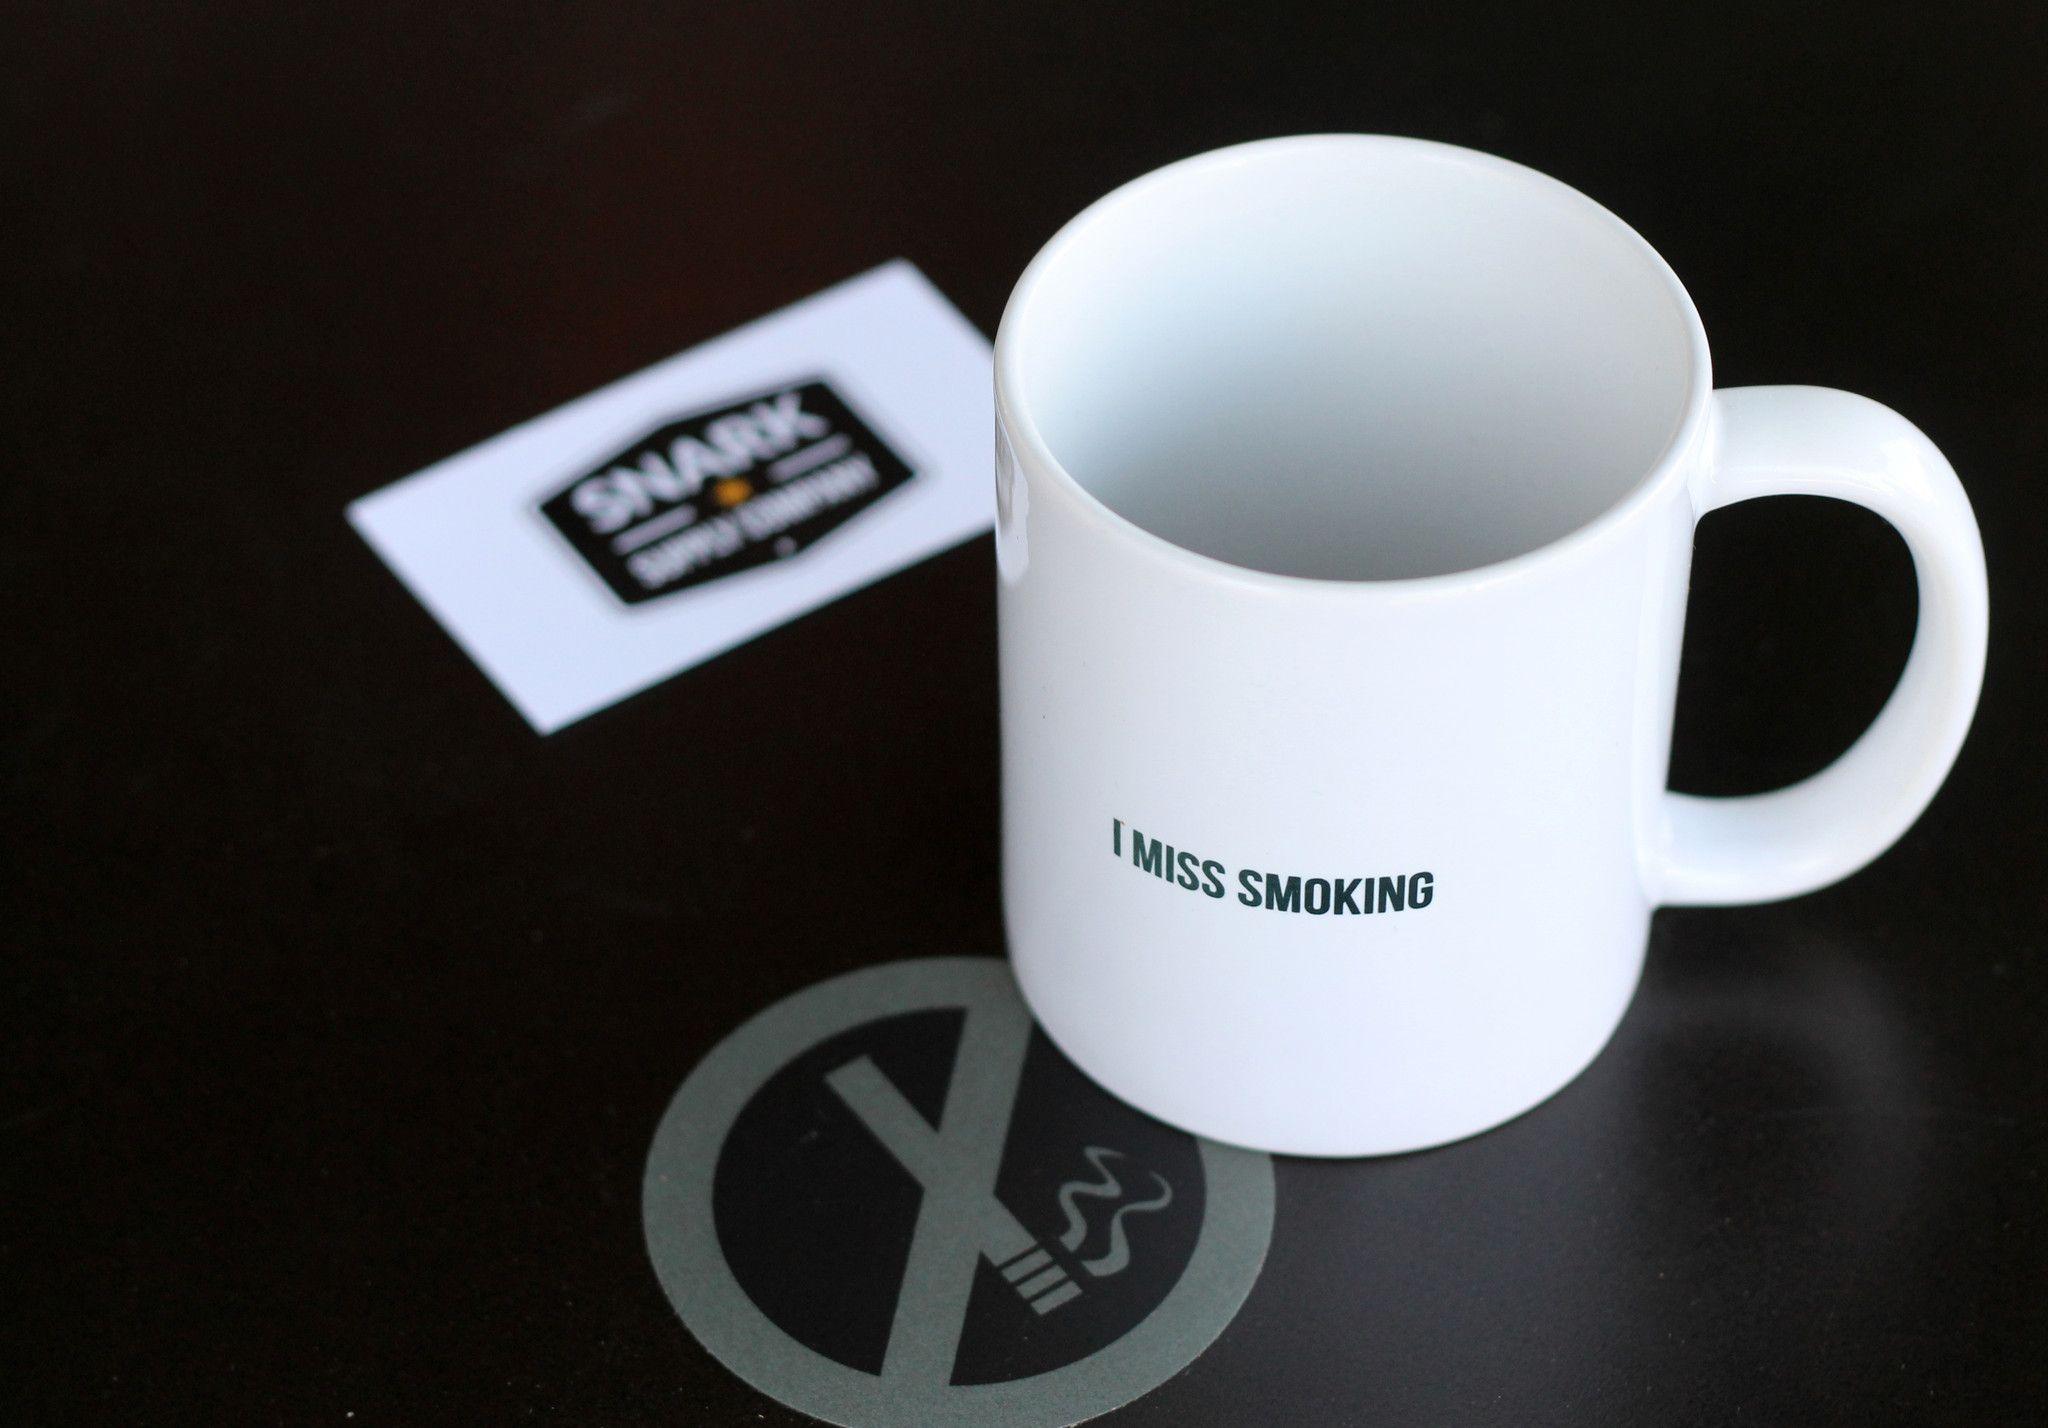 I Miss Smoking - Mug Shot – Snark Supply Co.